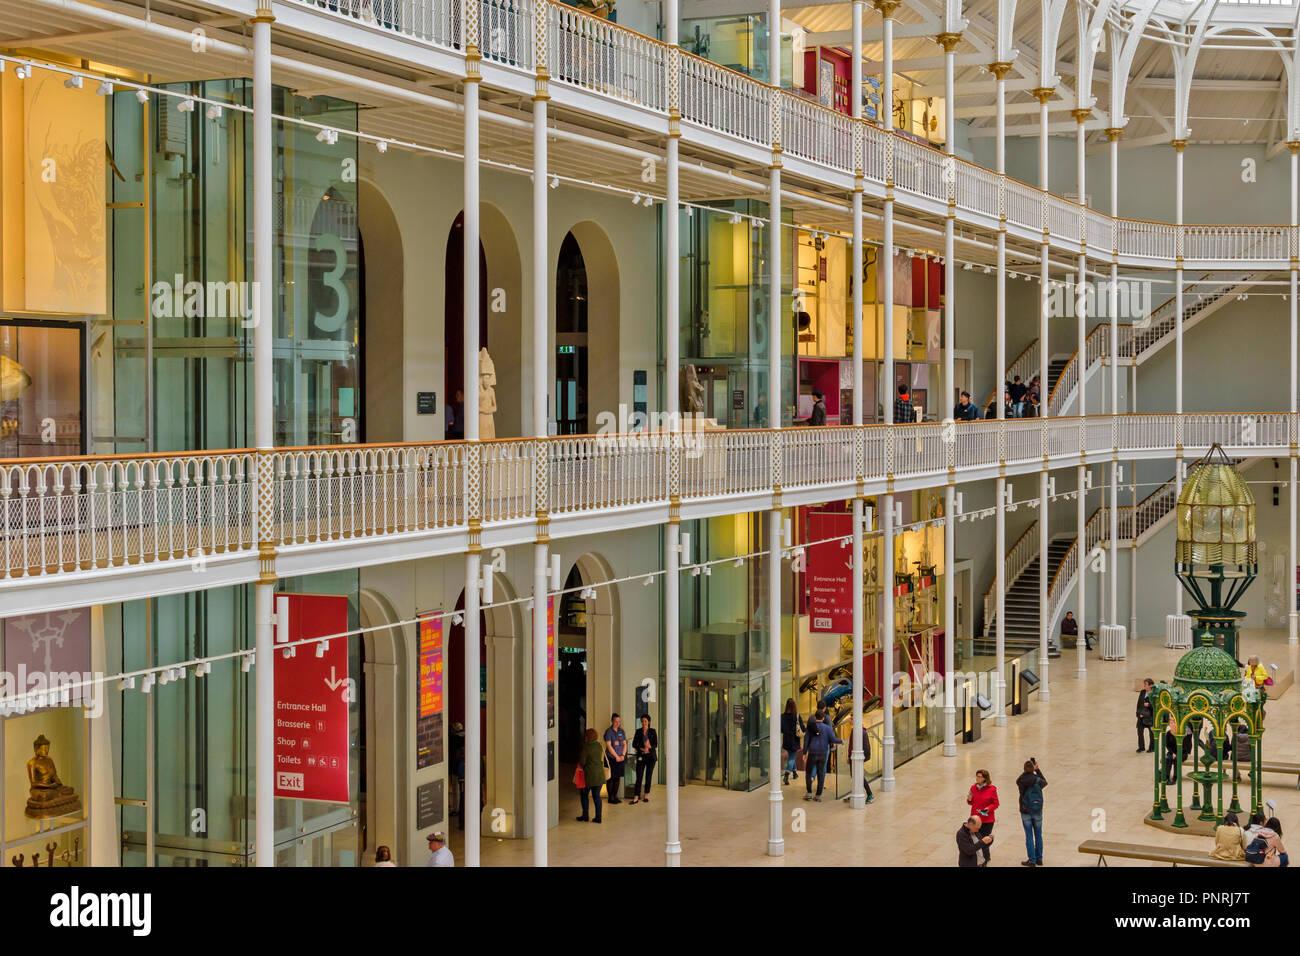 EDINBURGH SCOTLAND NATIONAL MUSEUM OF SCOTLAND INTERIOR WITH TWO BALCONIES - Stock Image